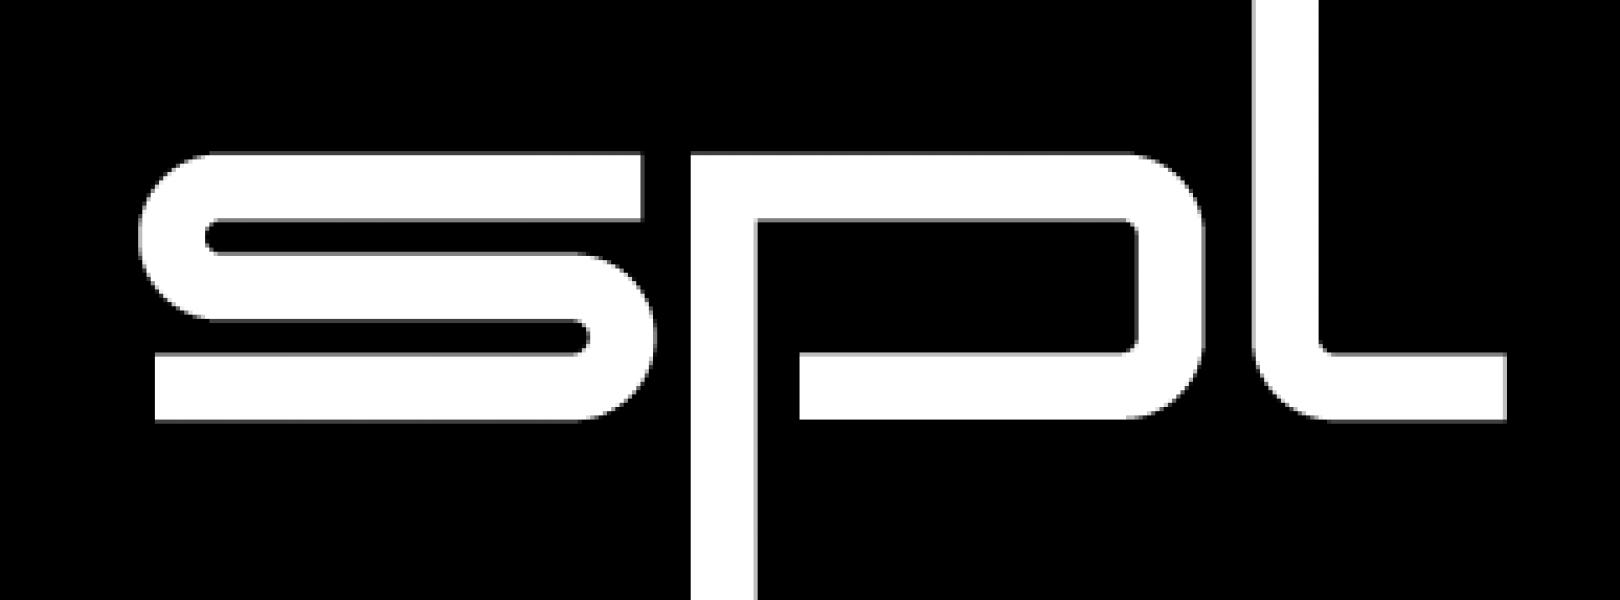 spl-logo-1620x600